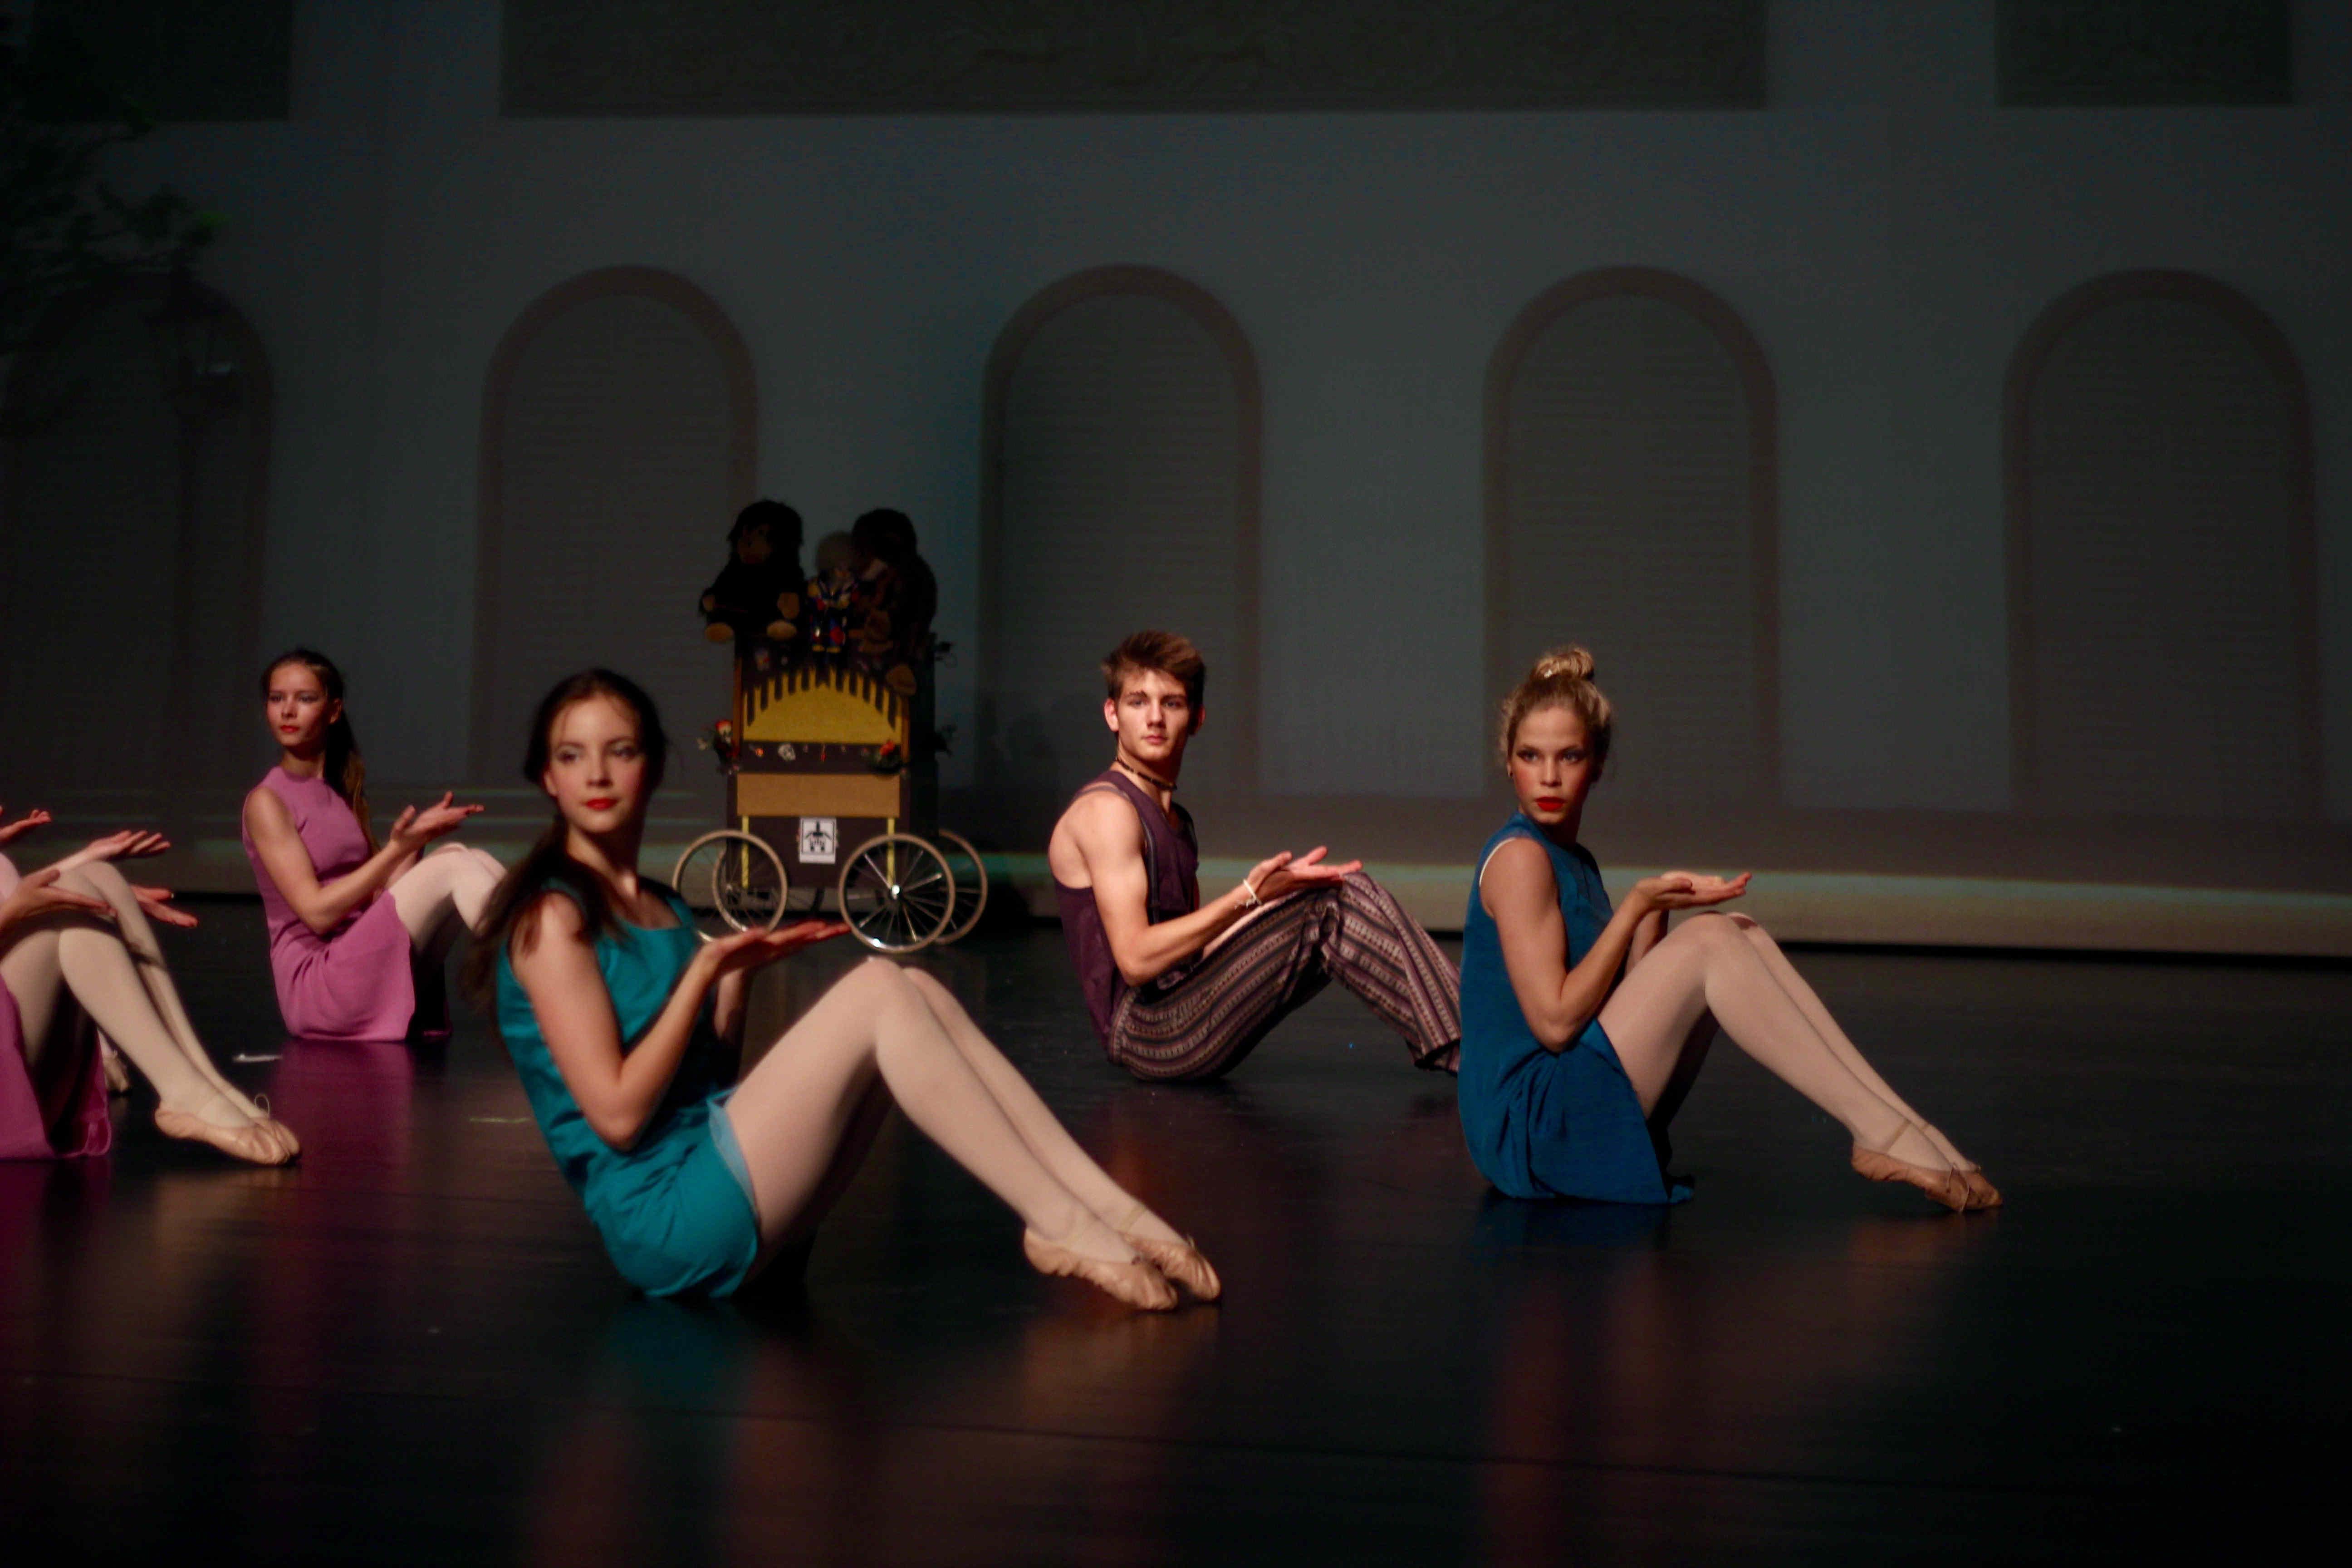 2015 Stadtsplitter Ballett Aschaffenburg Stadttheater Karlsplatz